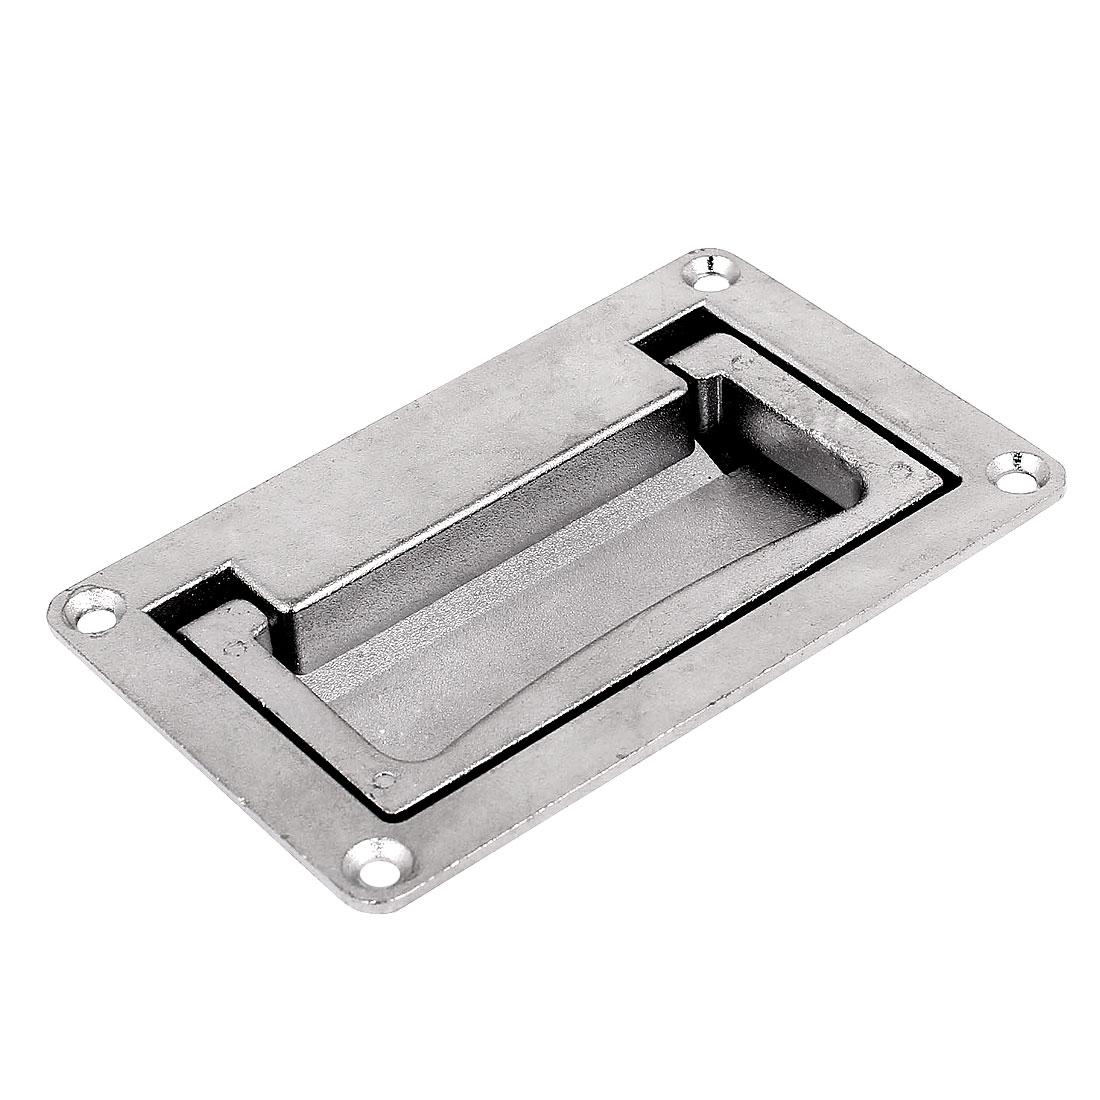 Door drawer 11cm x 7cm stainless steel recessed flush sliding carry